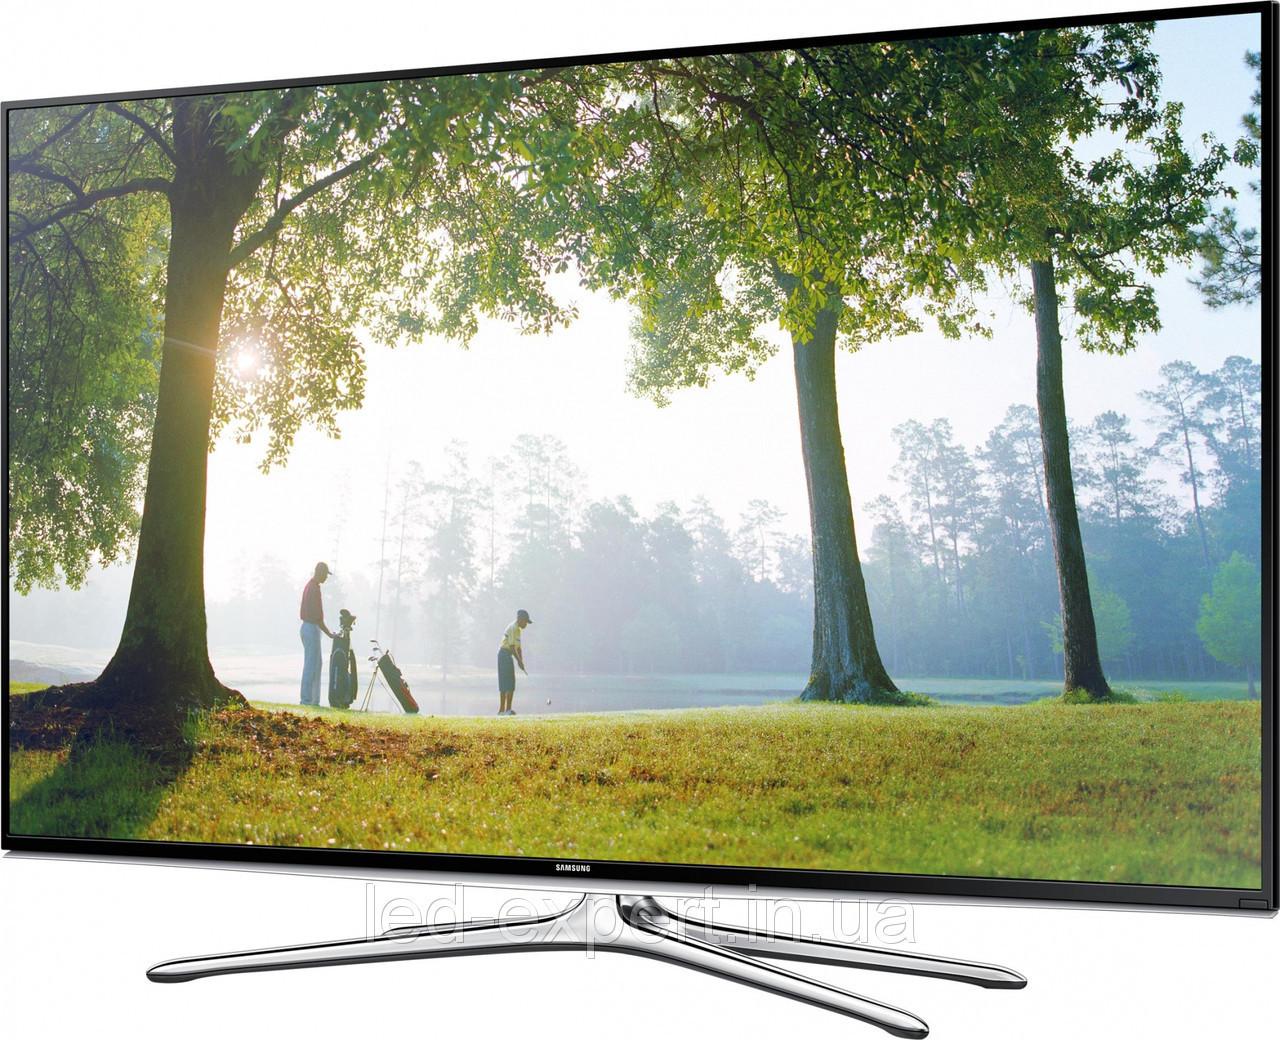 Телевизор Samsung UE48H6500 (400Гц, Full HD, Smart, Wi-Fi, 3D, ДУ Touch Control, DVB-S2)